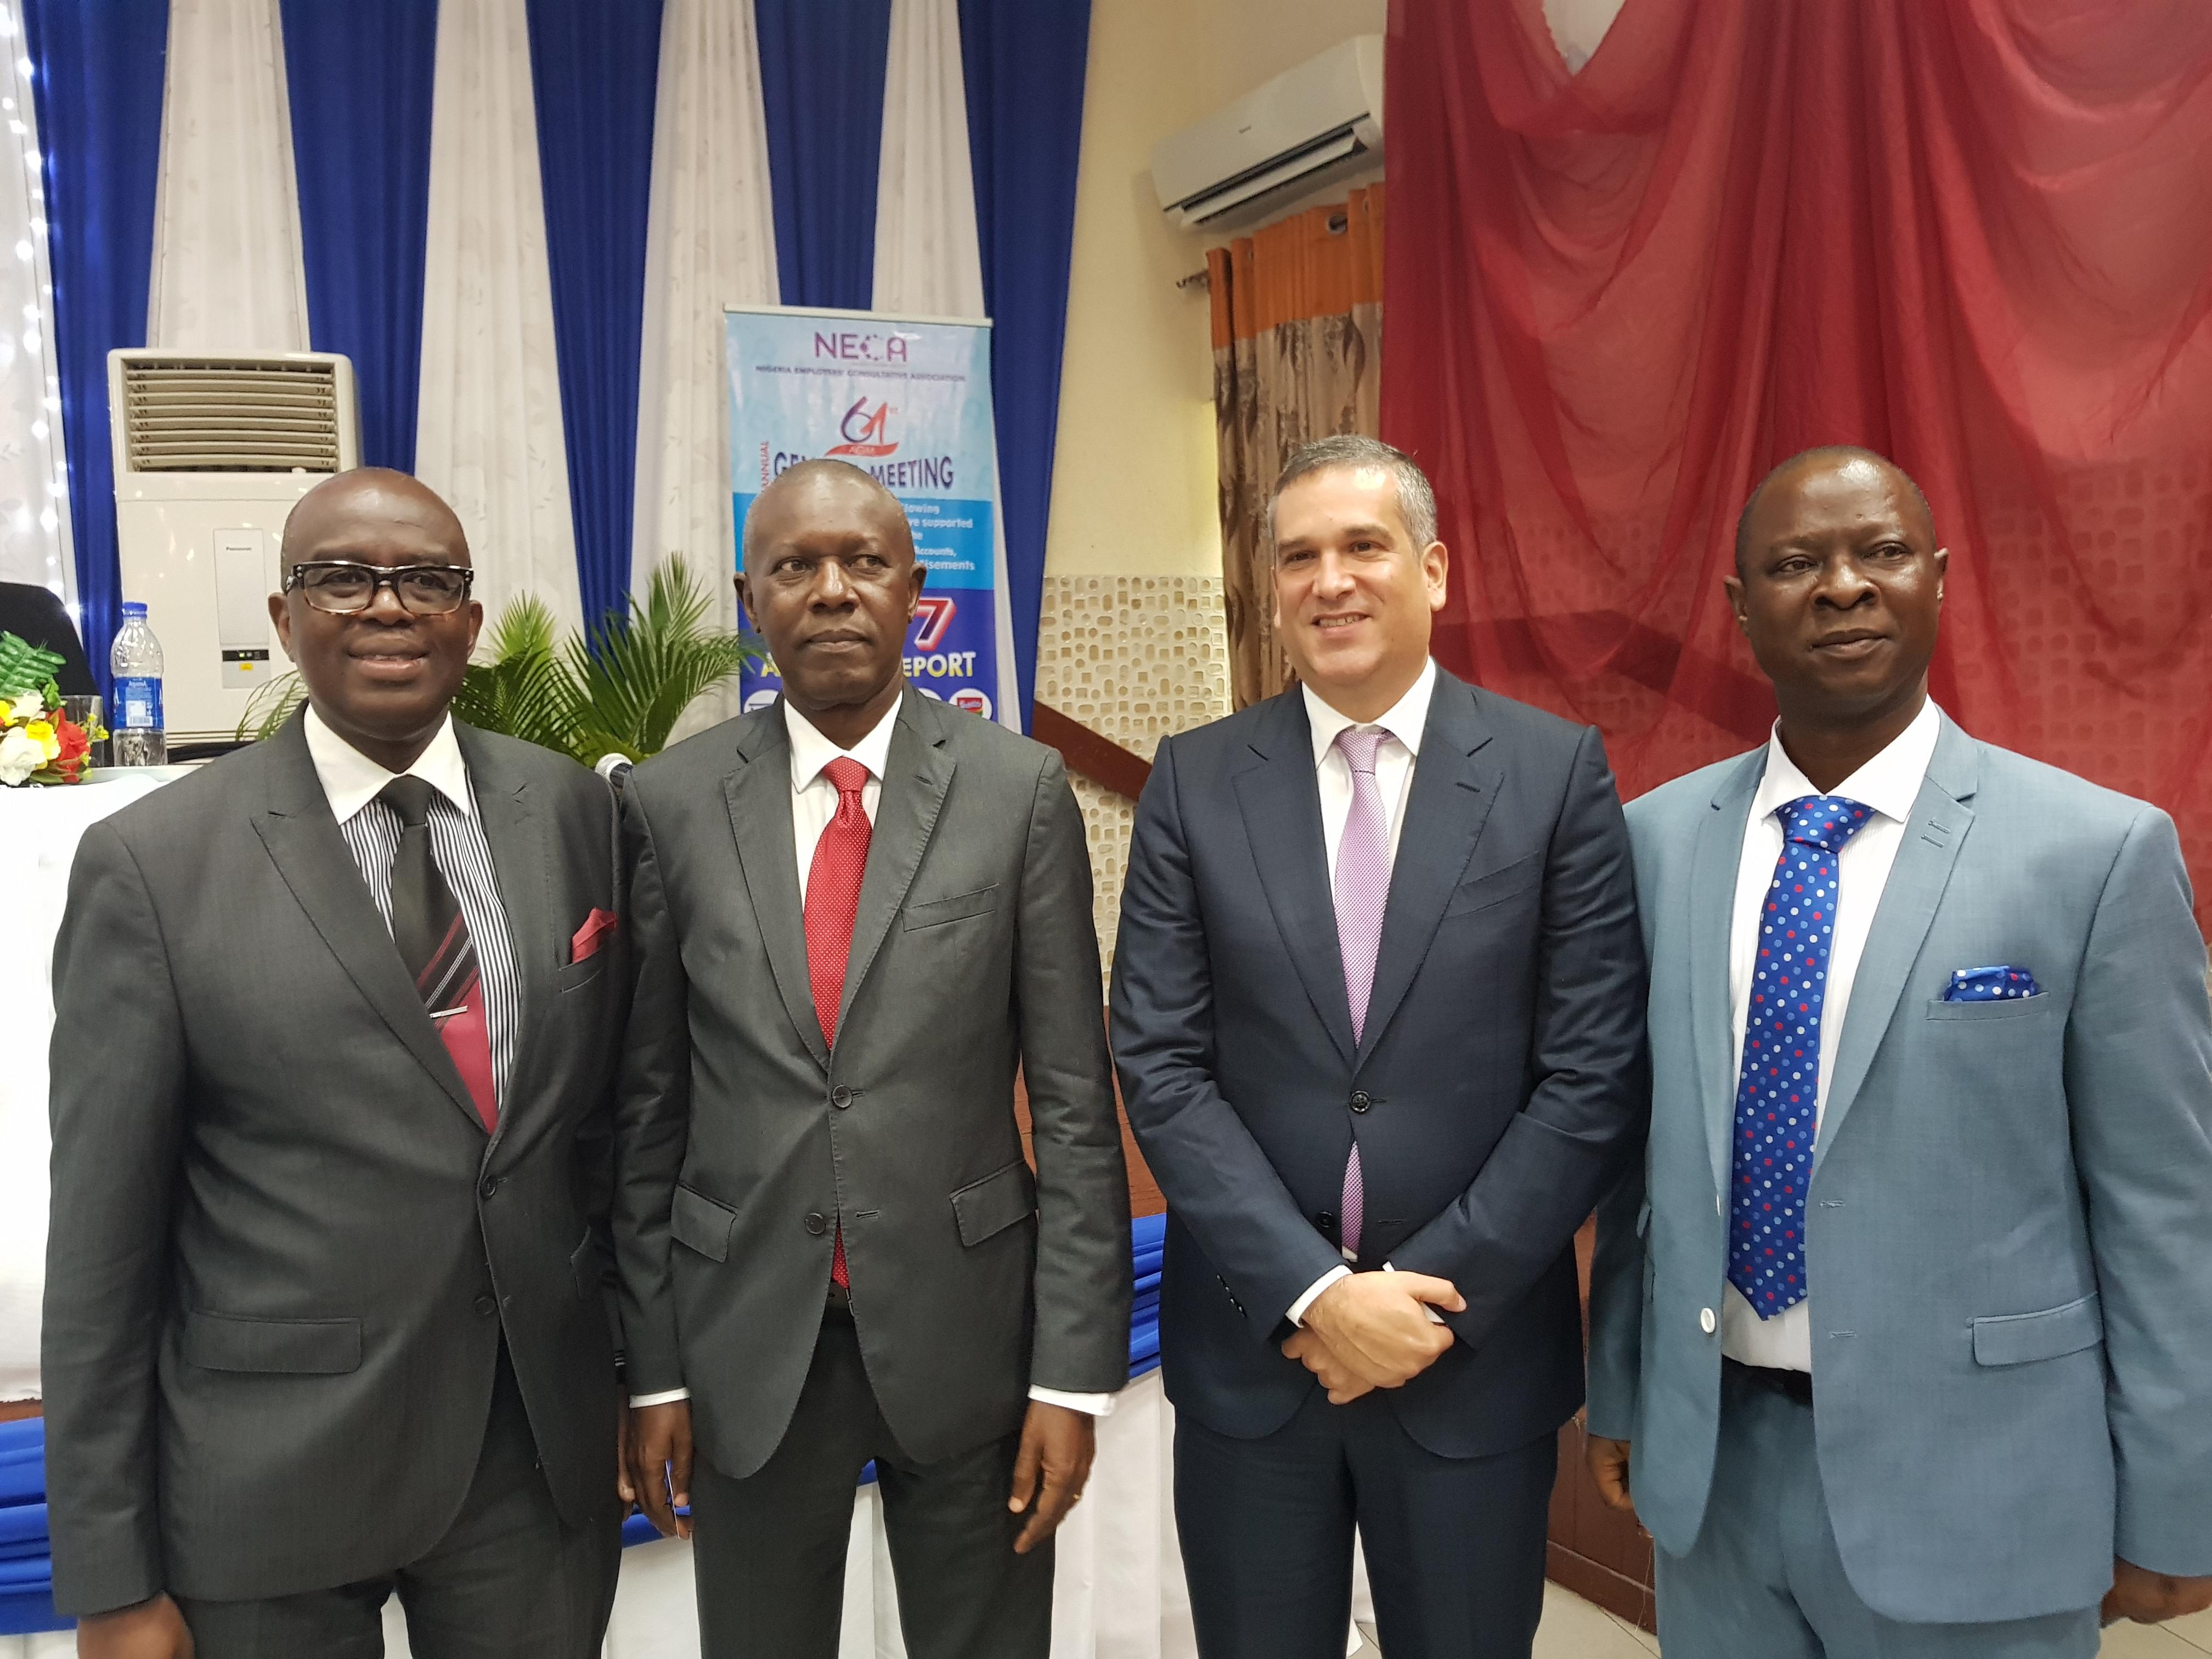 Photo of Nestlé Nigeria MD appointed NECA's 2nd VP